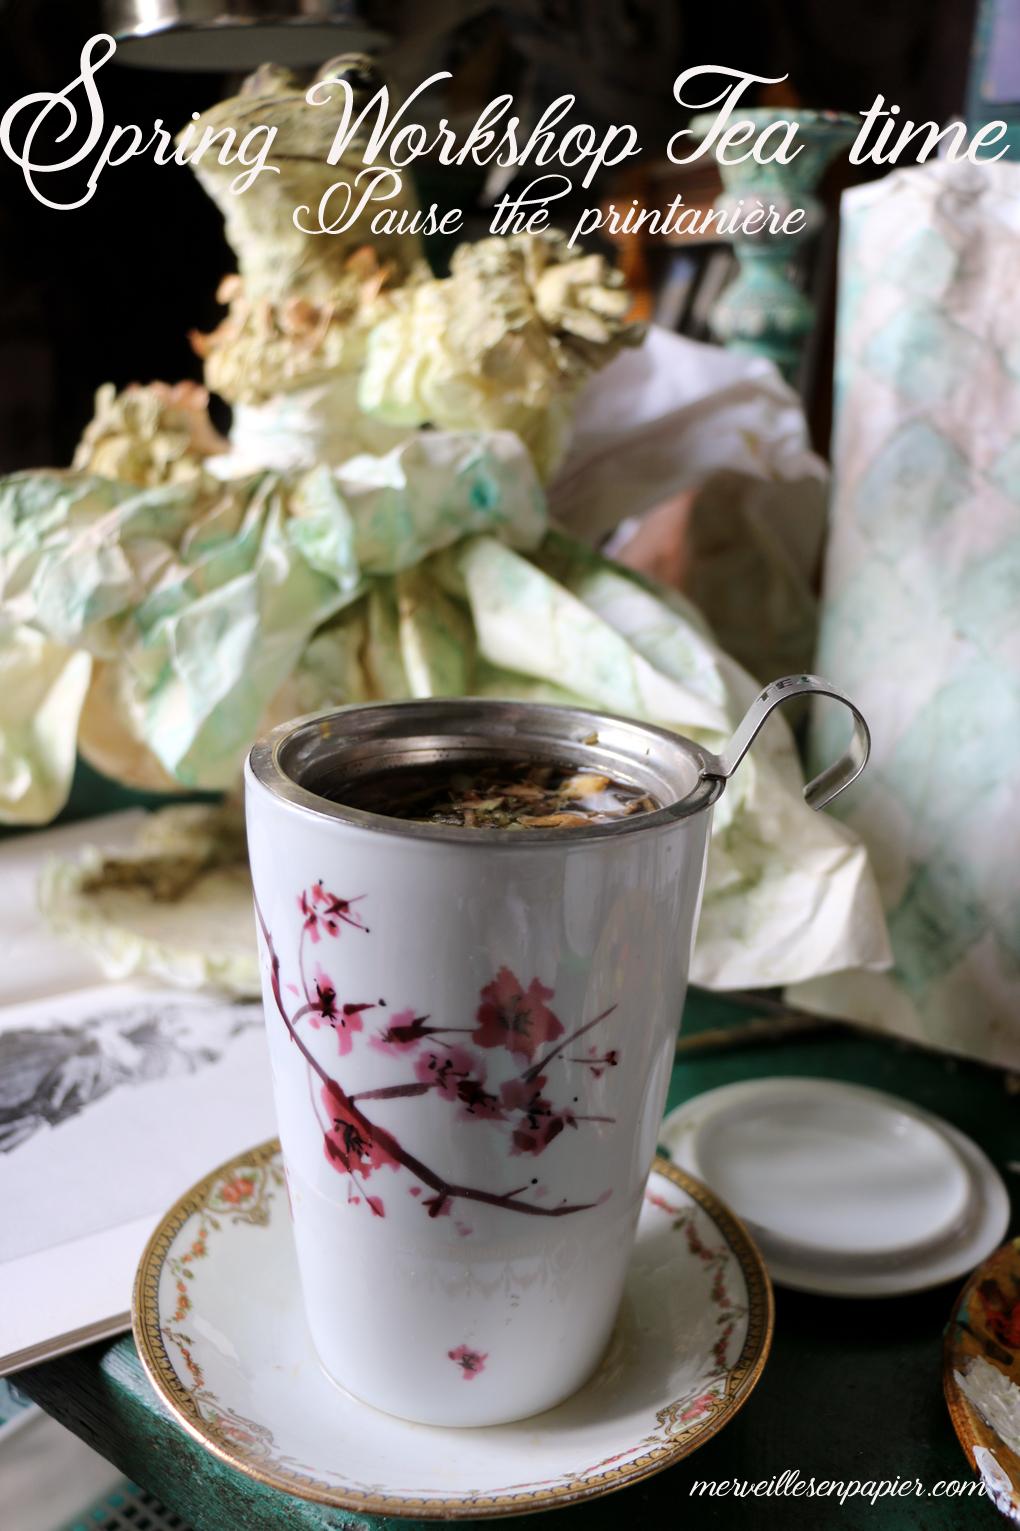 My Eigenart cherry tree tea mug